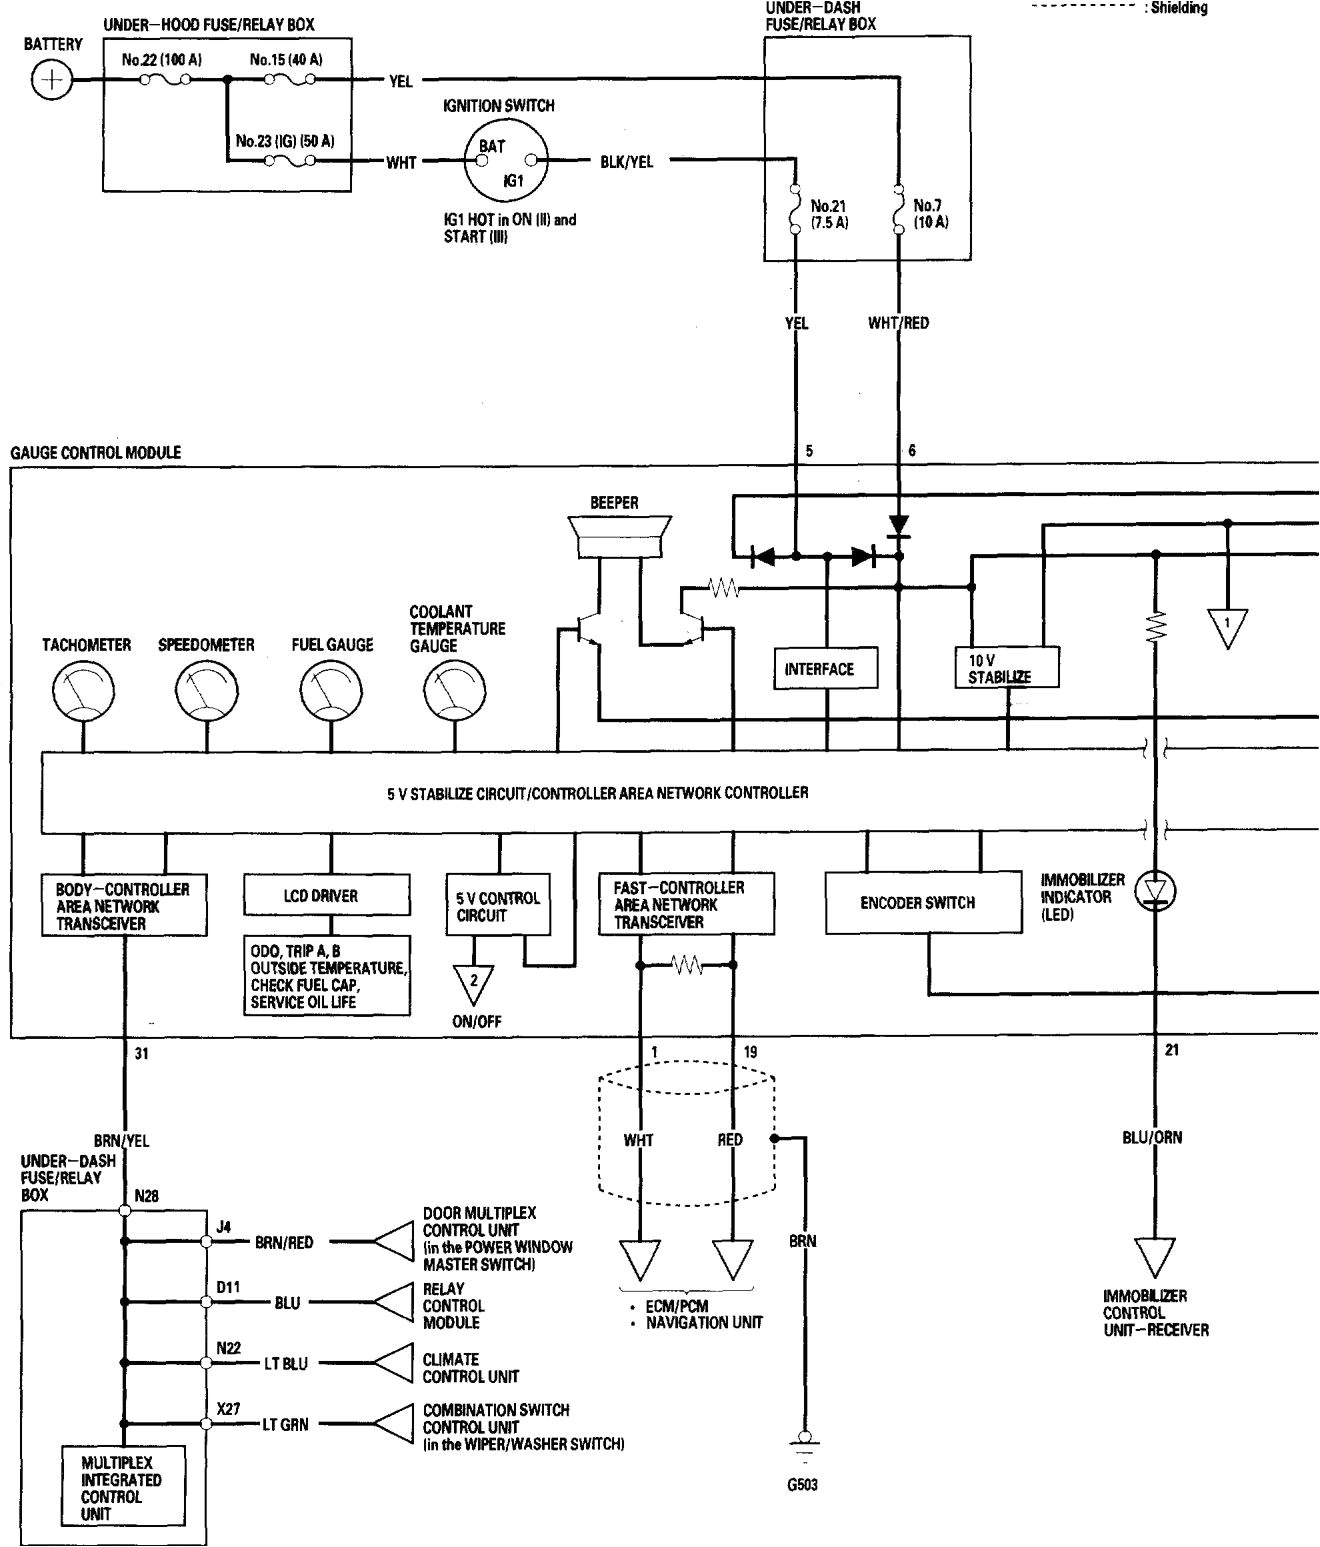 2018 Honda Accord Wiring Diagram Honda Accord Wiring Blog Wiring Diagram